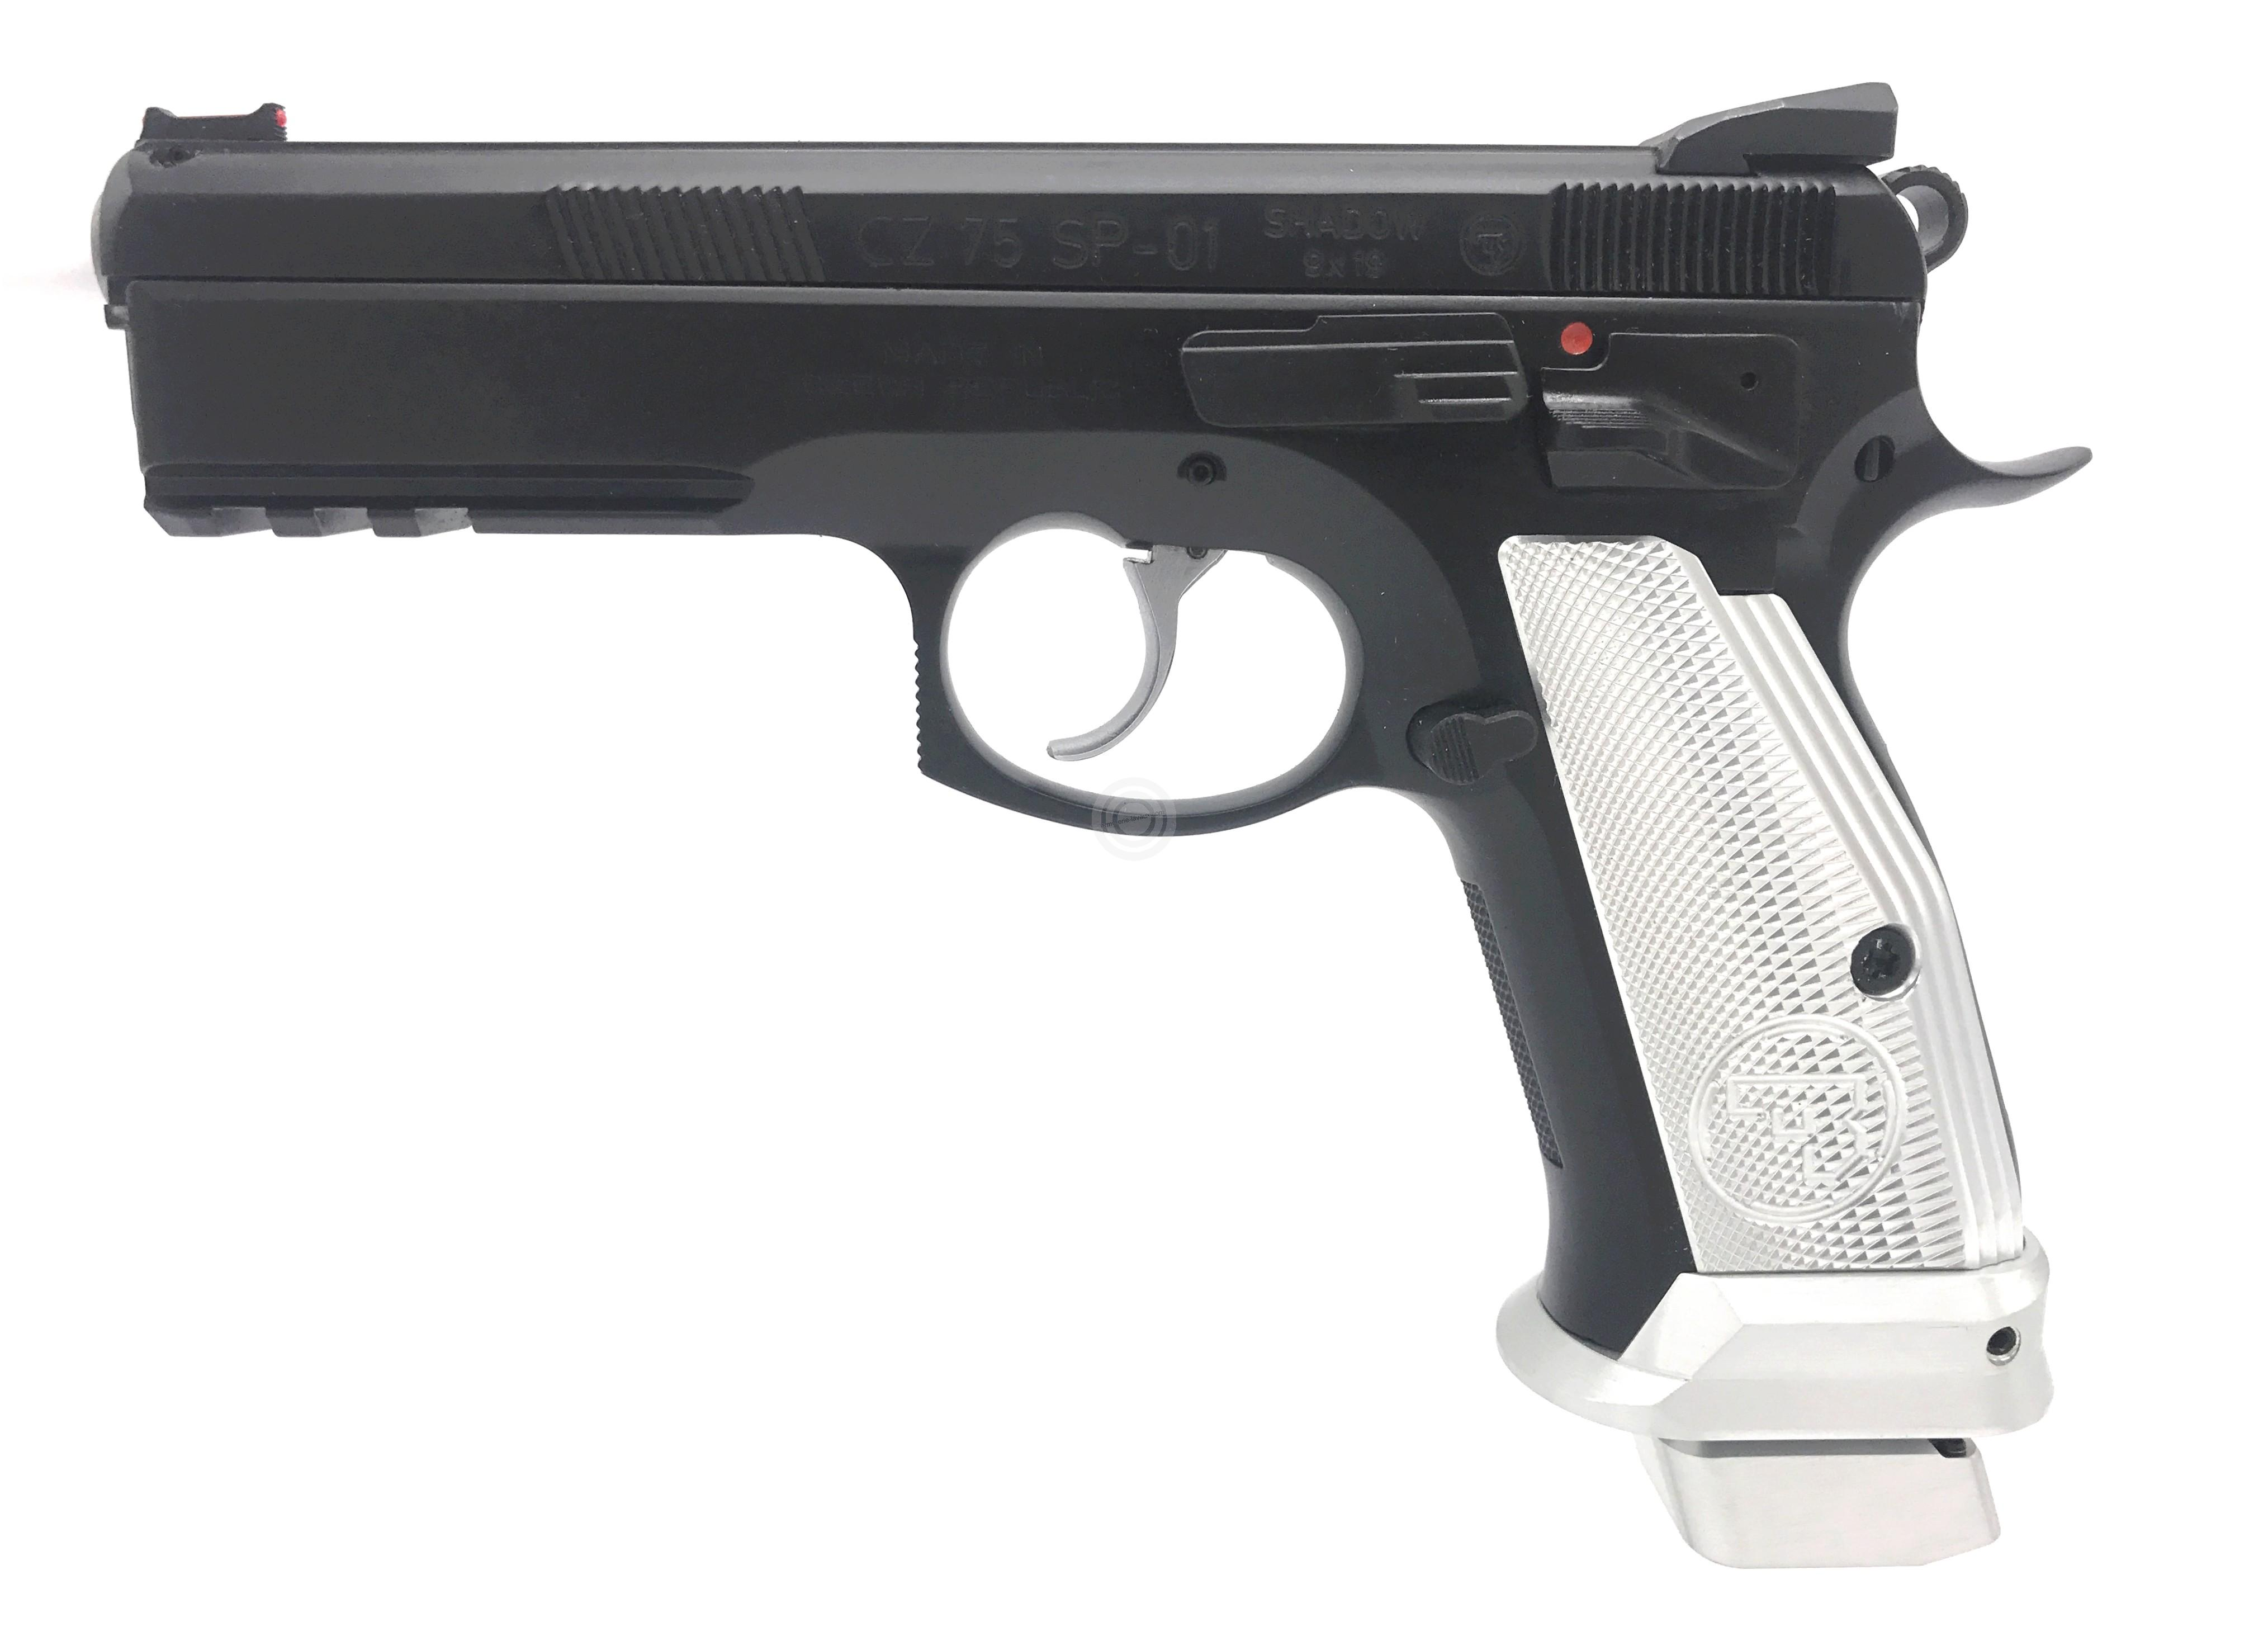 Pistolet CZ 75 SP01 Shadow French Mamba Silver calibre 9x19